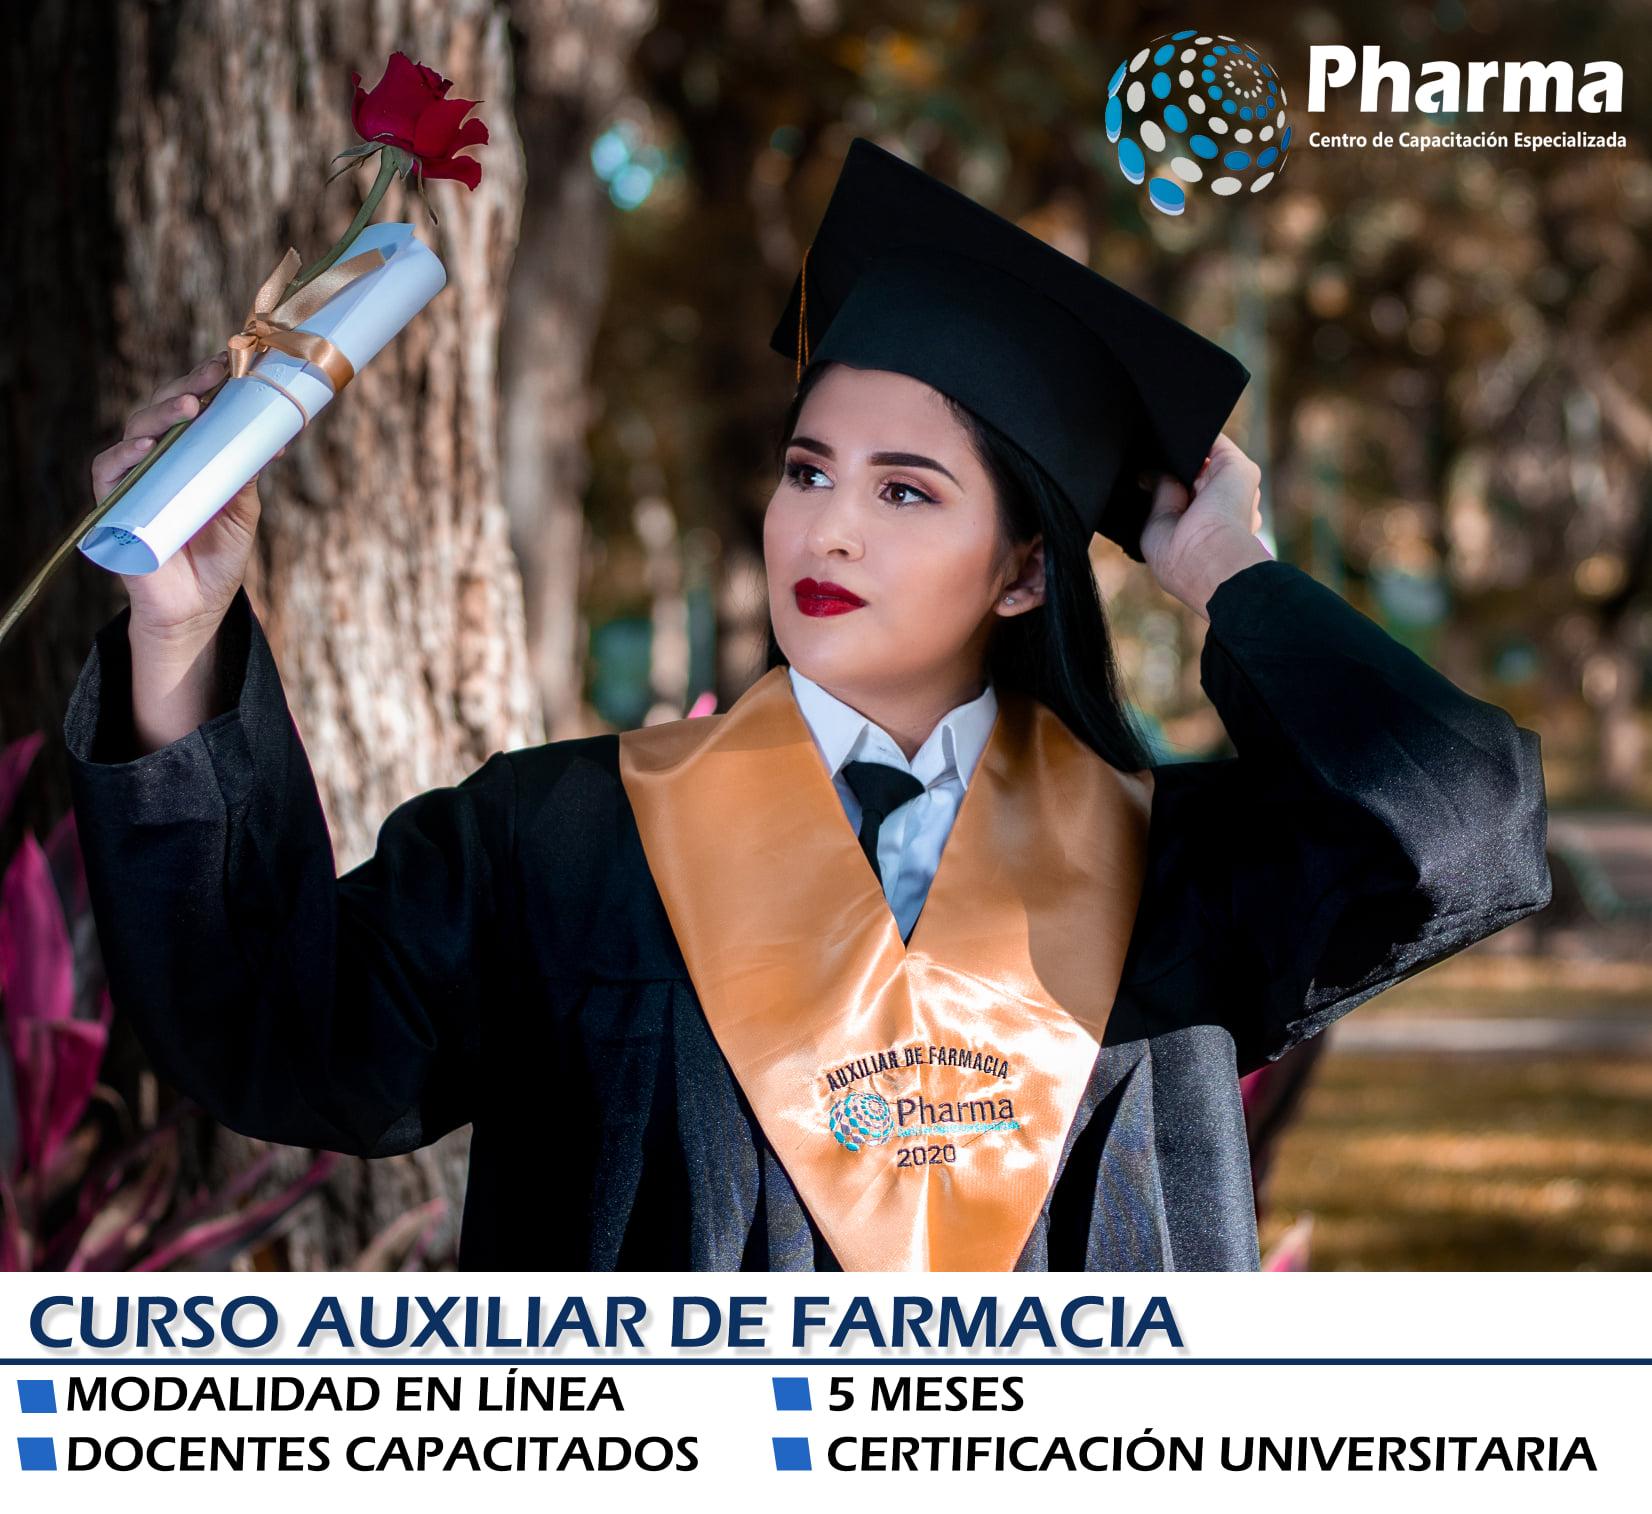 Curso de Auxiliar de Farmacia - Página web de pharmabolivia